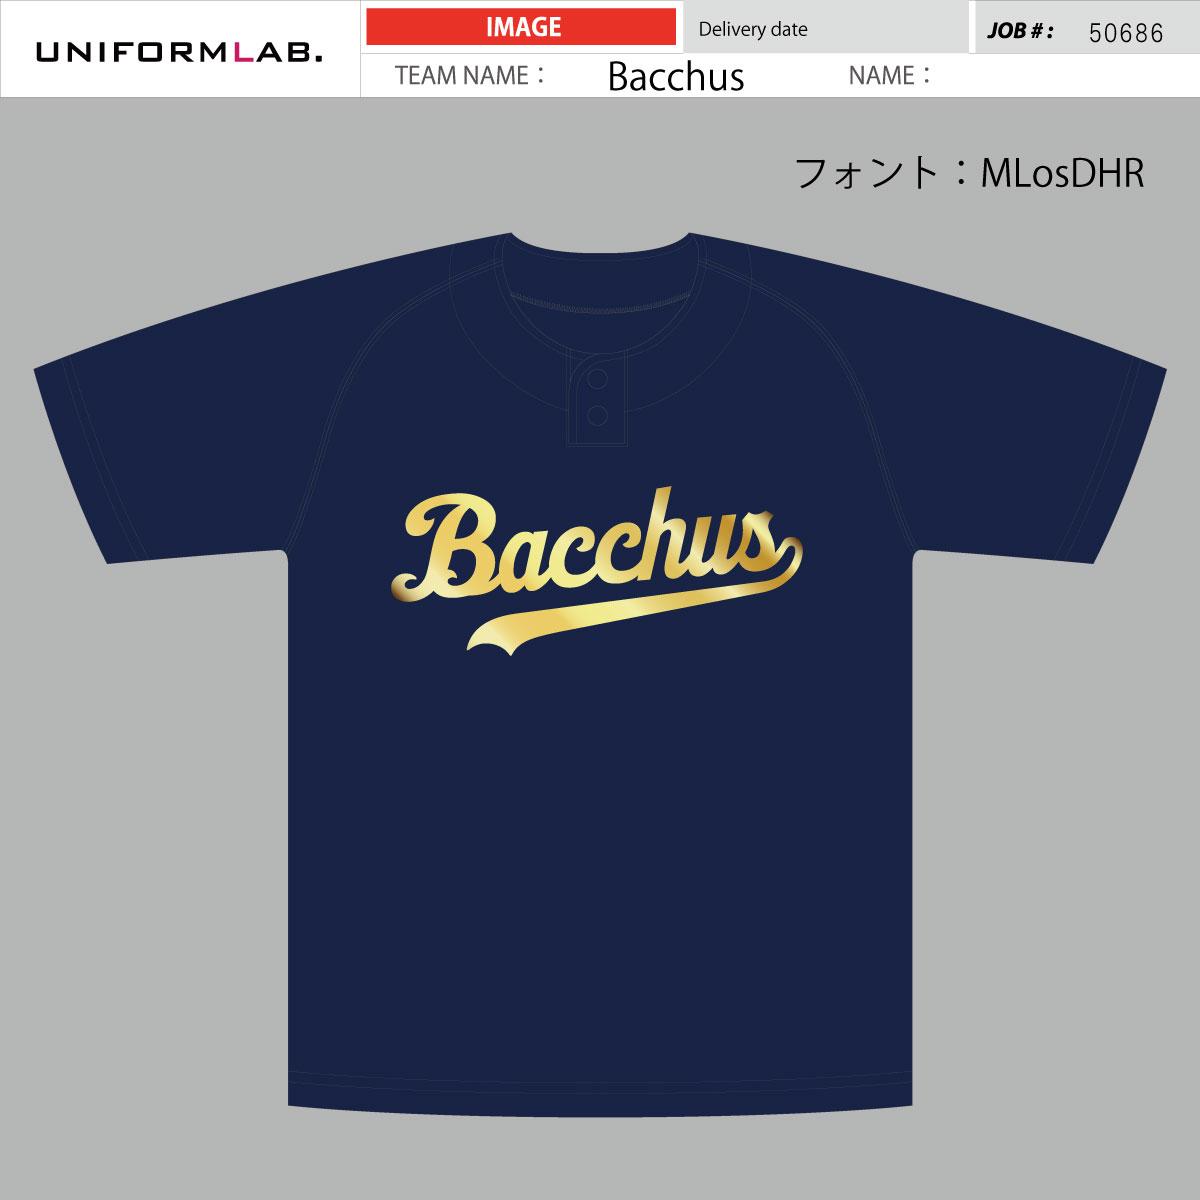 50686-Bacchus